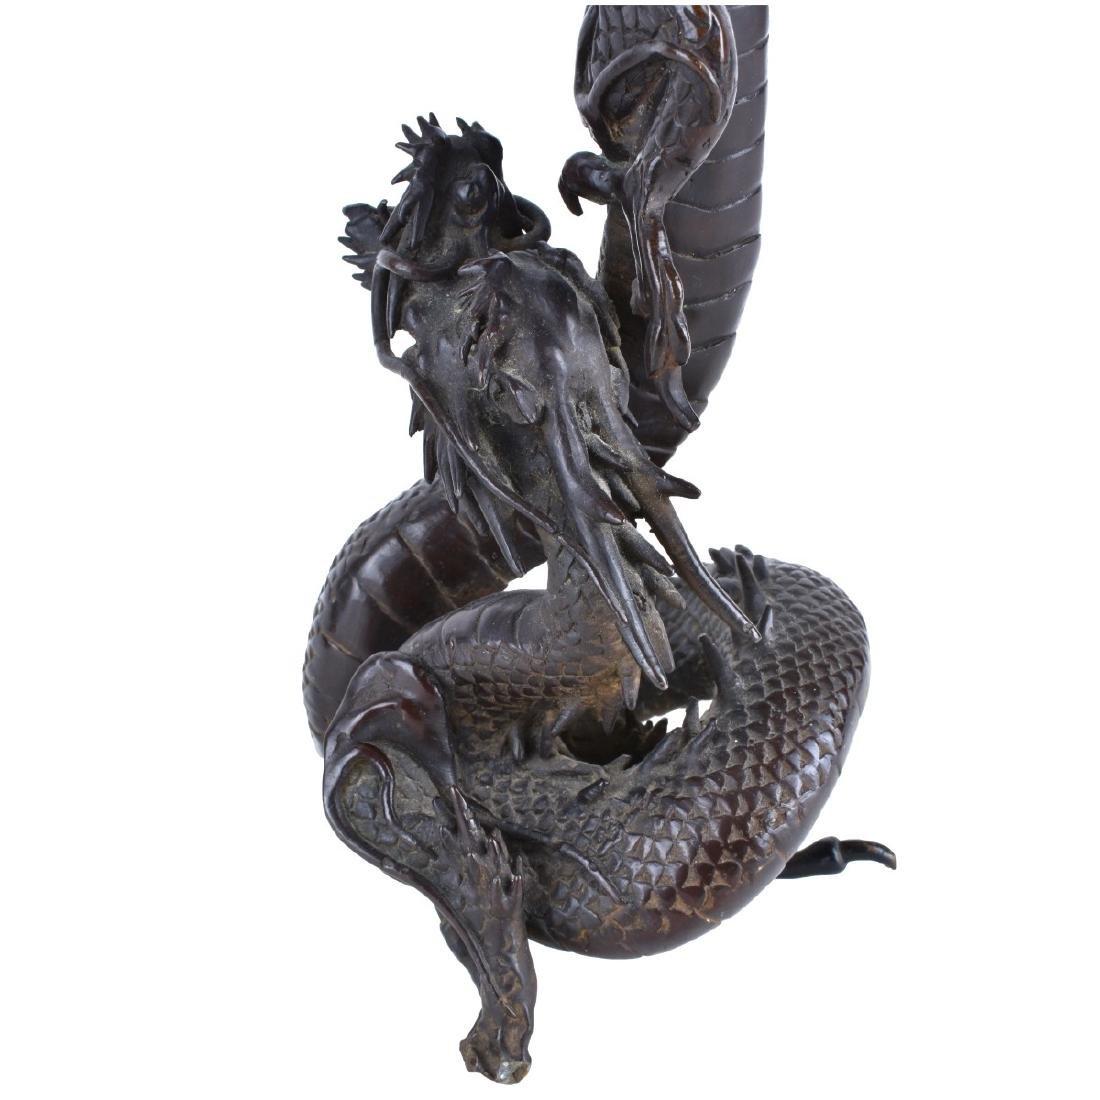 Chinese Bronze Dragon Candlesticks - 2